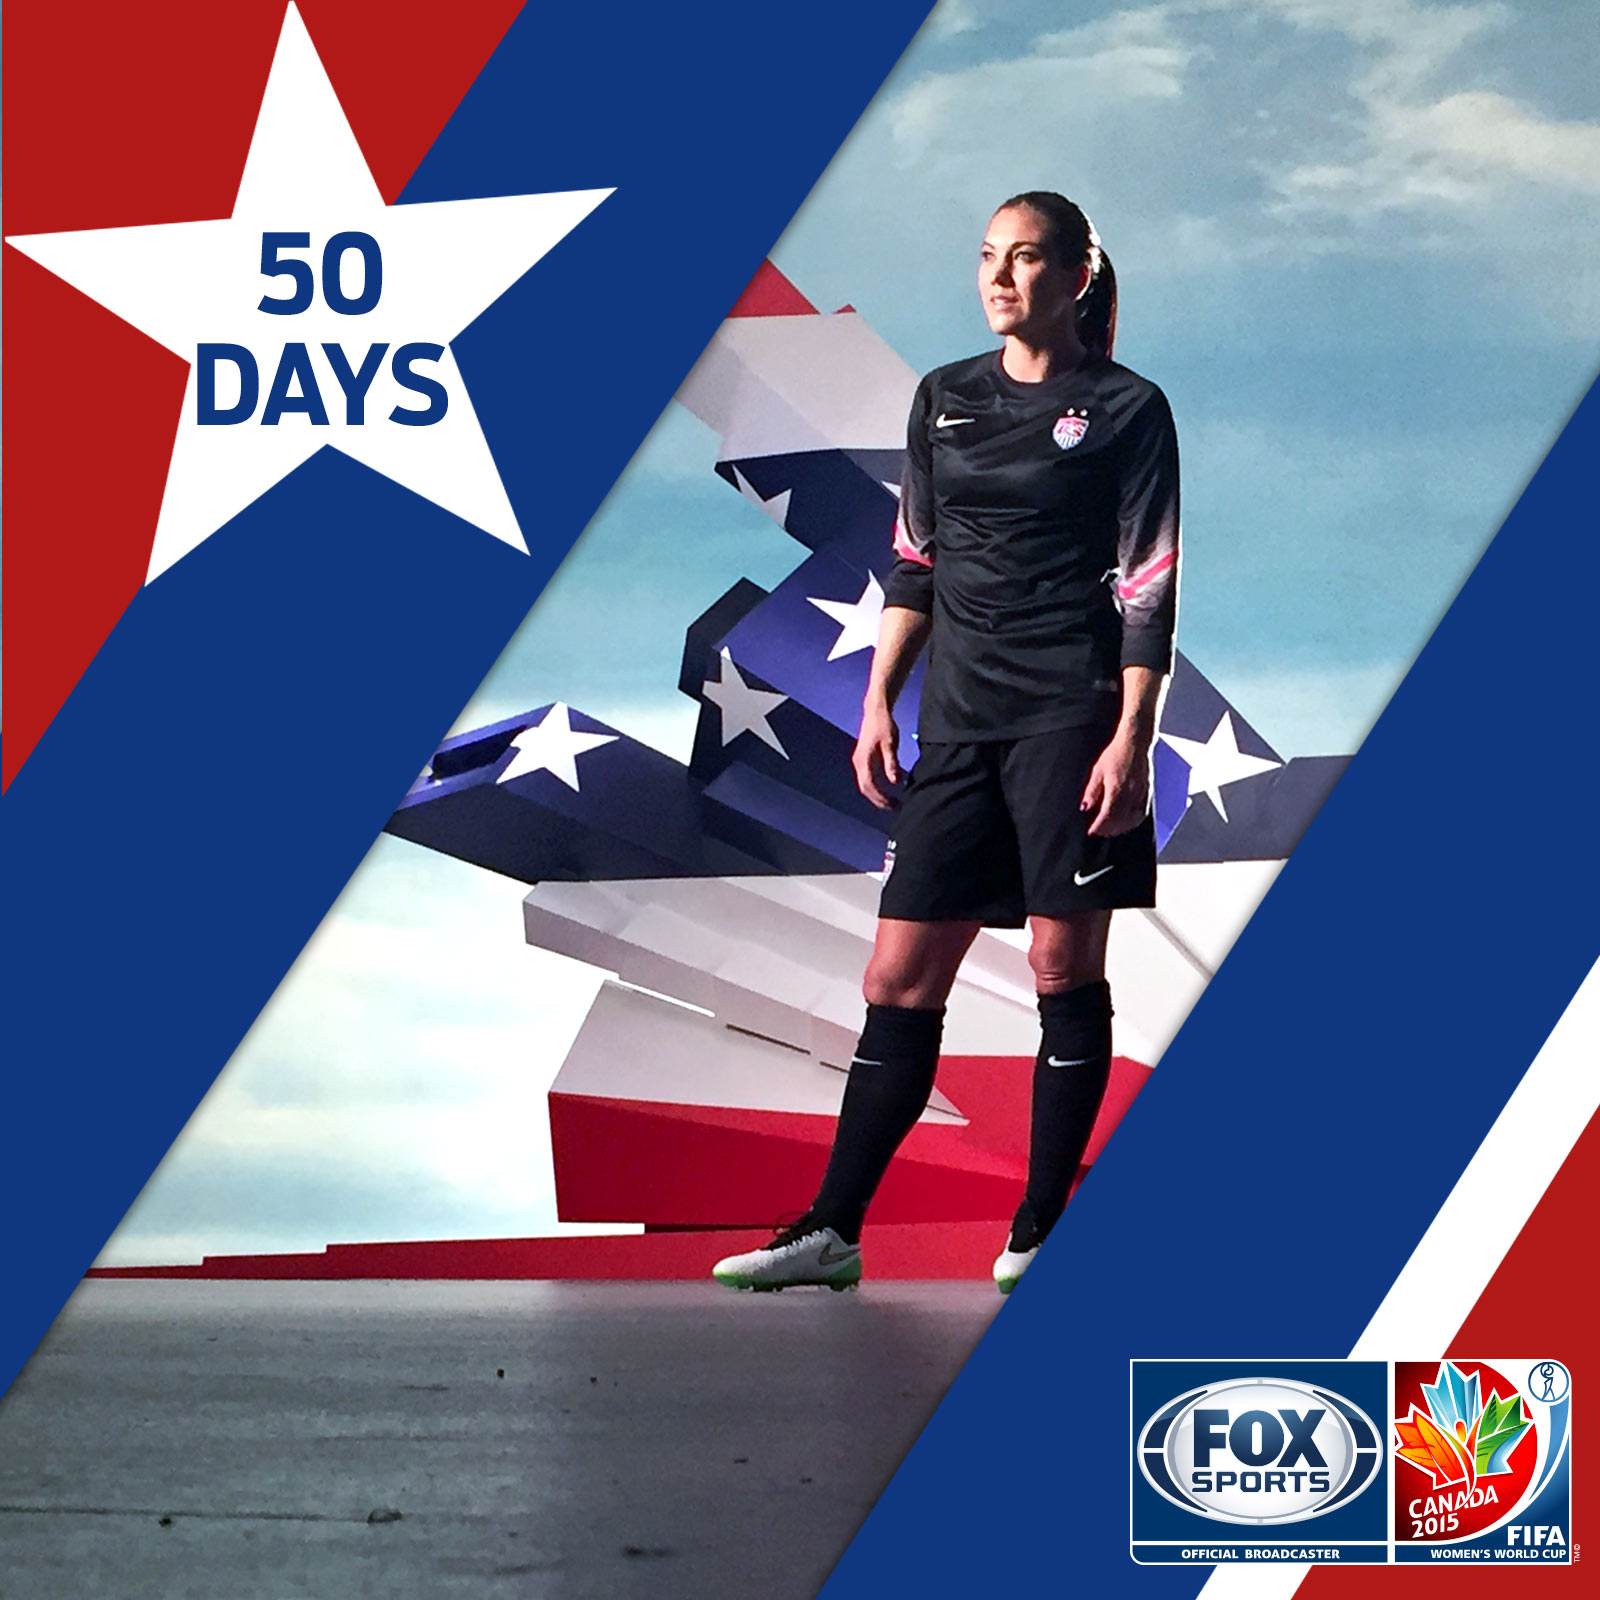 world-cup-women's-soccer-vertical-square.jpg